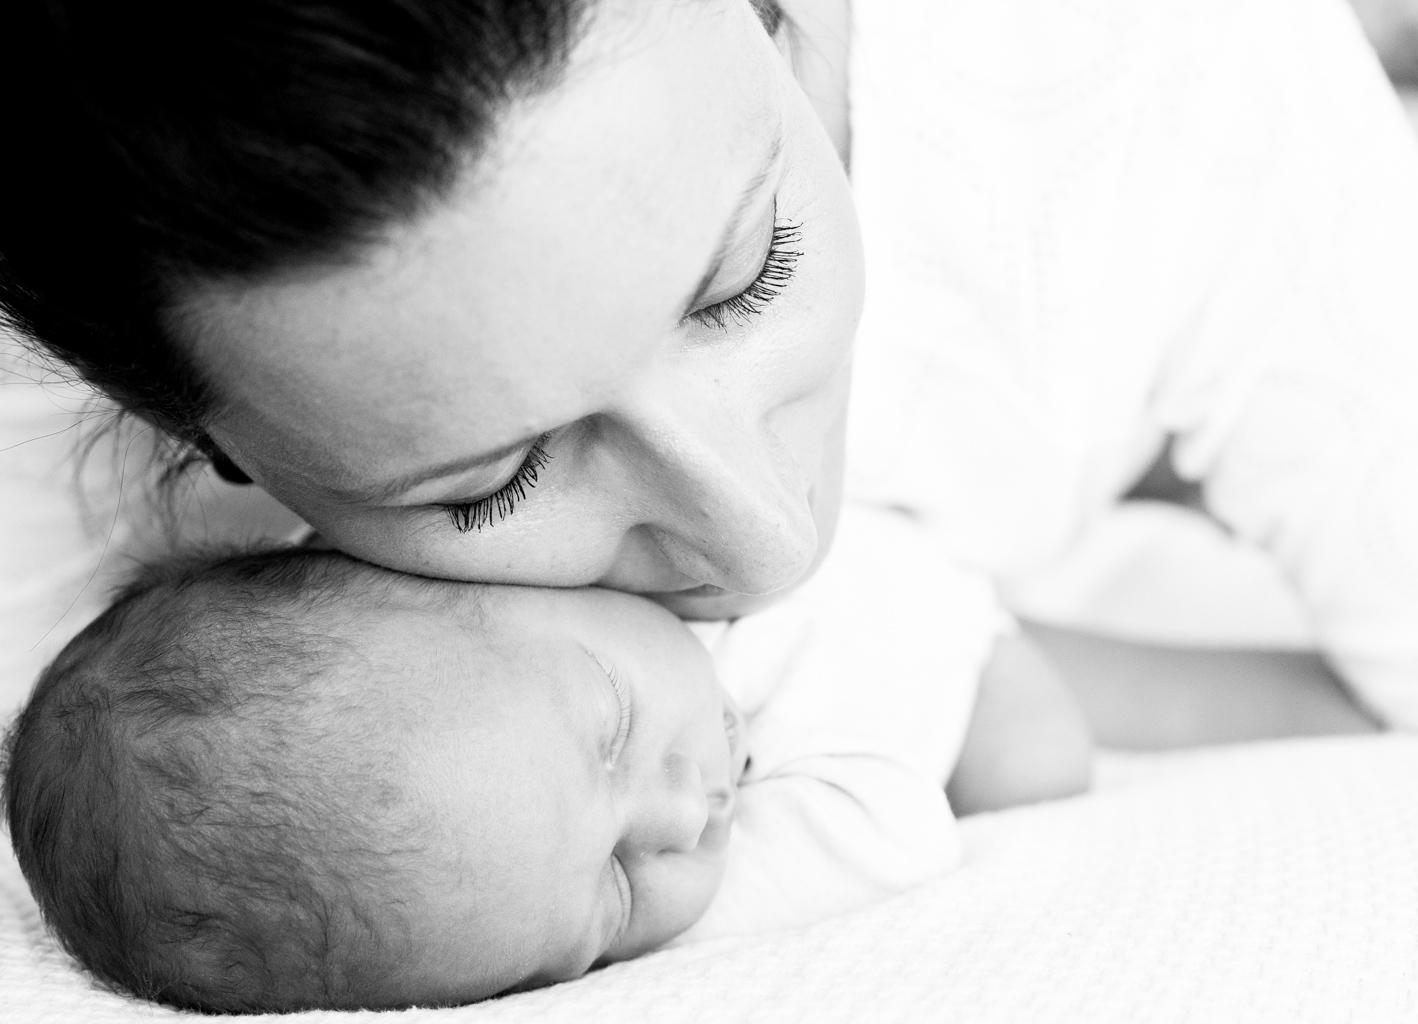 Newborn - Fotos - 06-2016